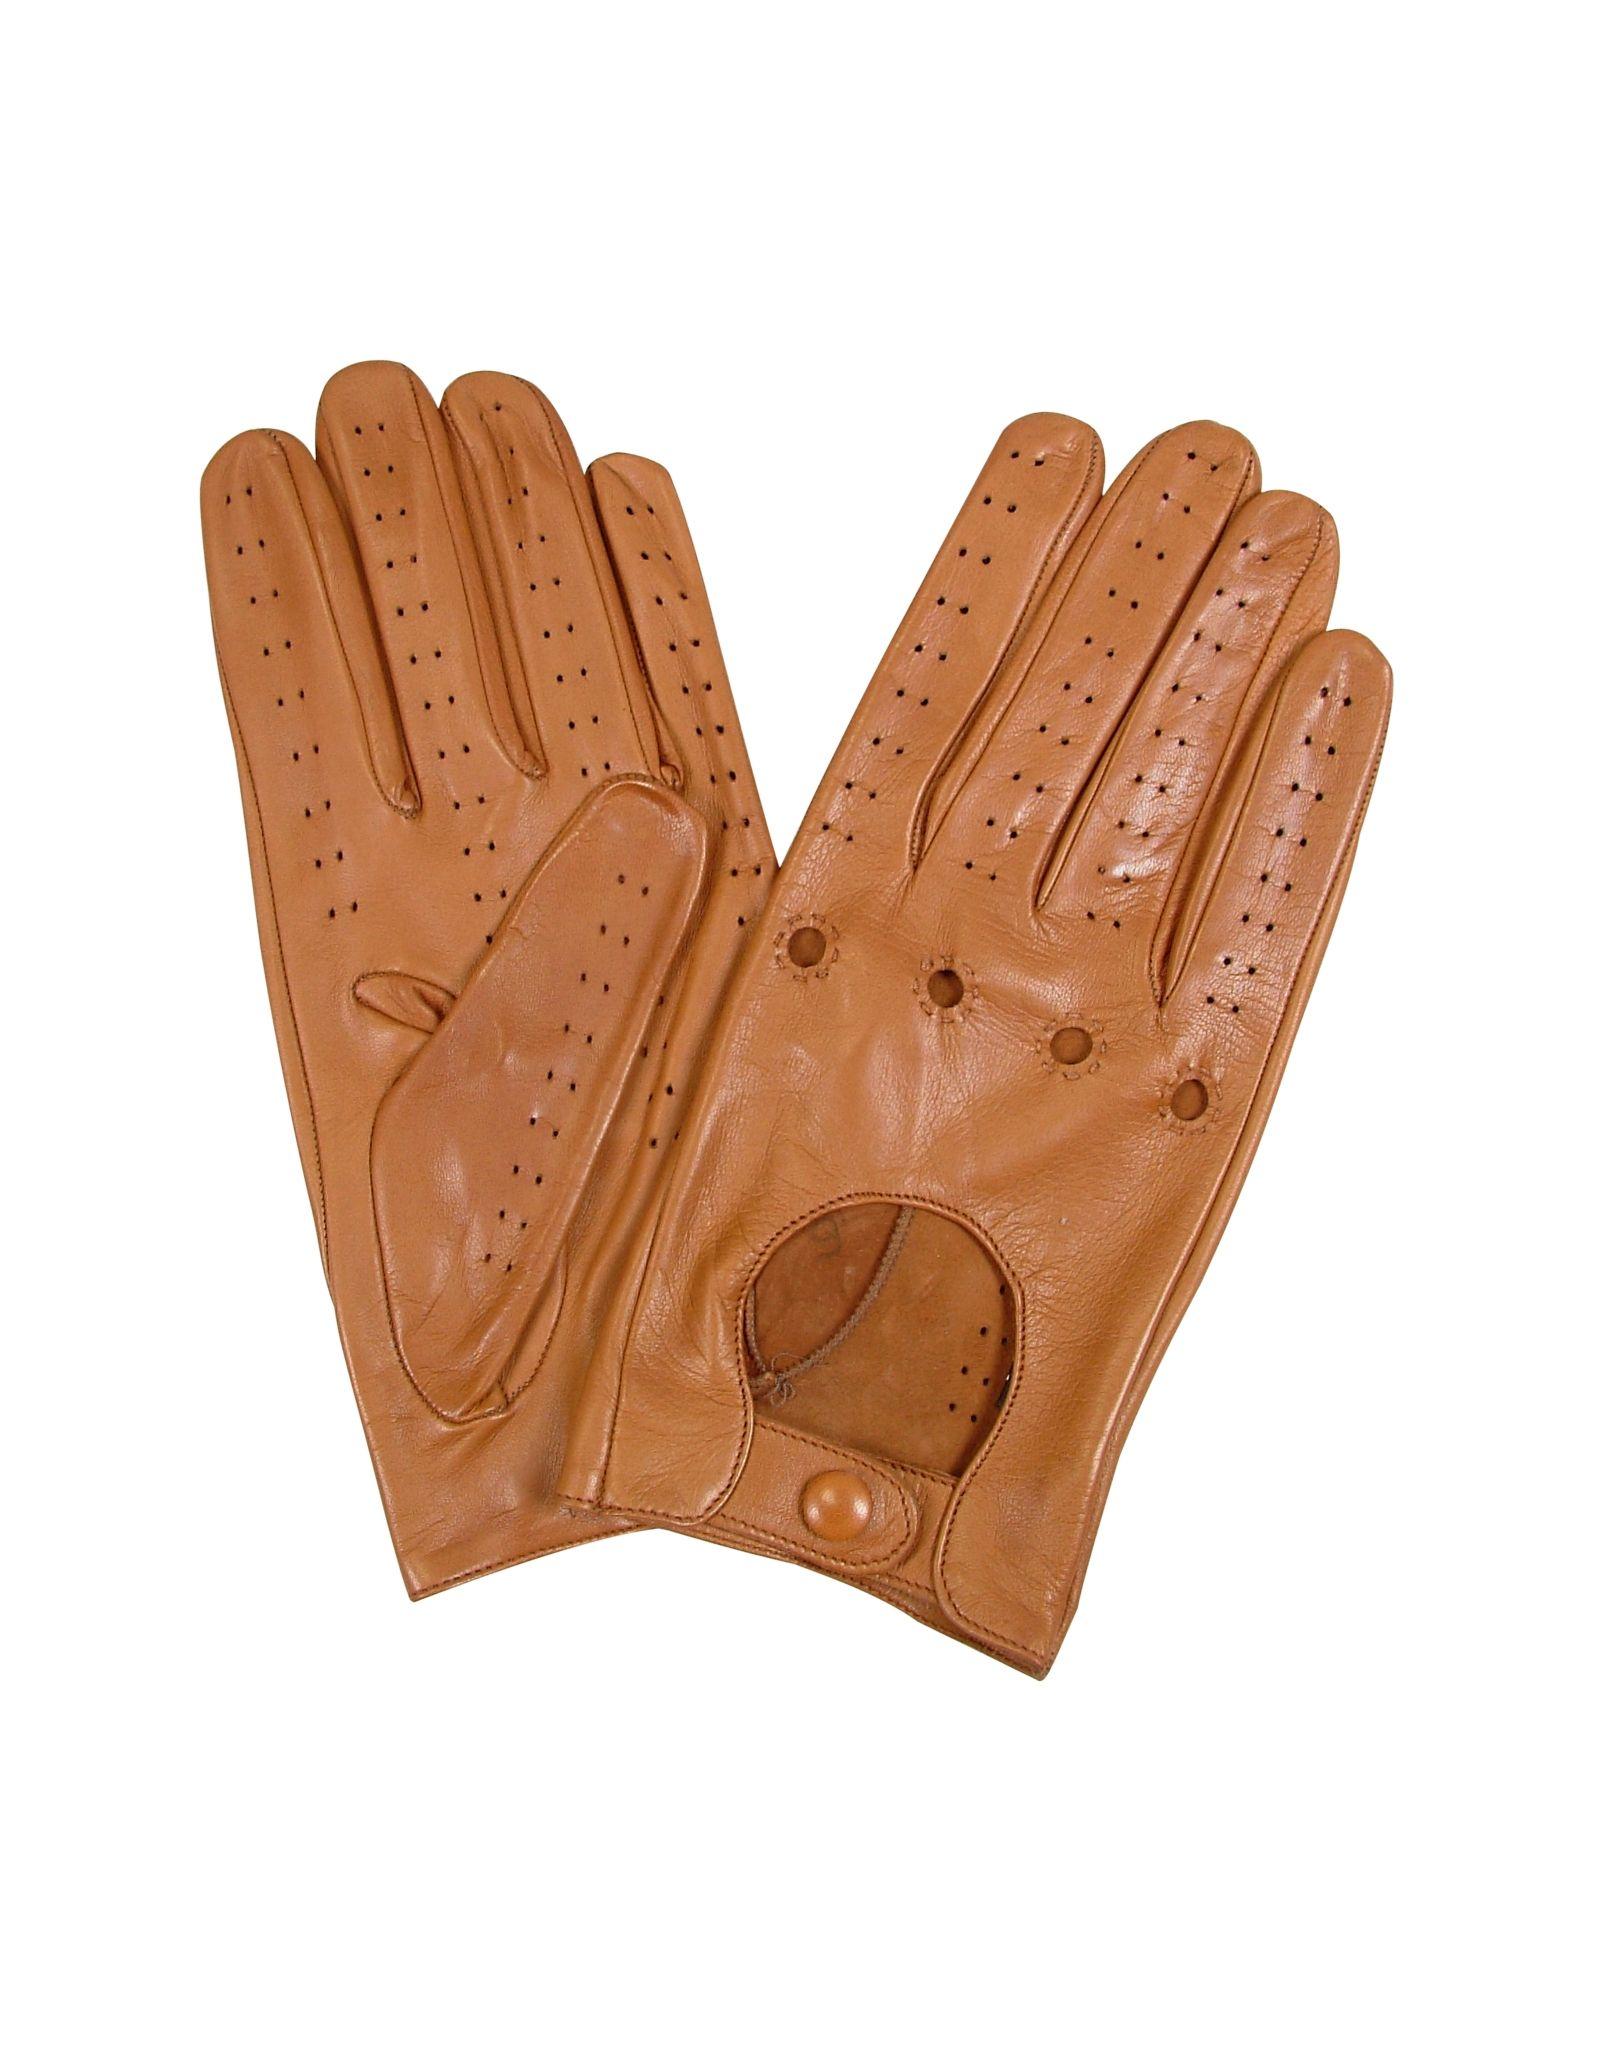 gants homme en cuir italien marron forzieri 98 sur gifts nos 100. Black Bedroom Furniture Sets. Home Design Ideas